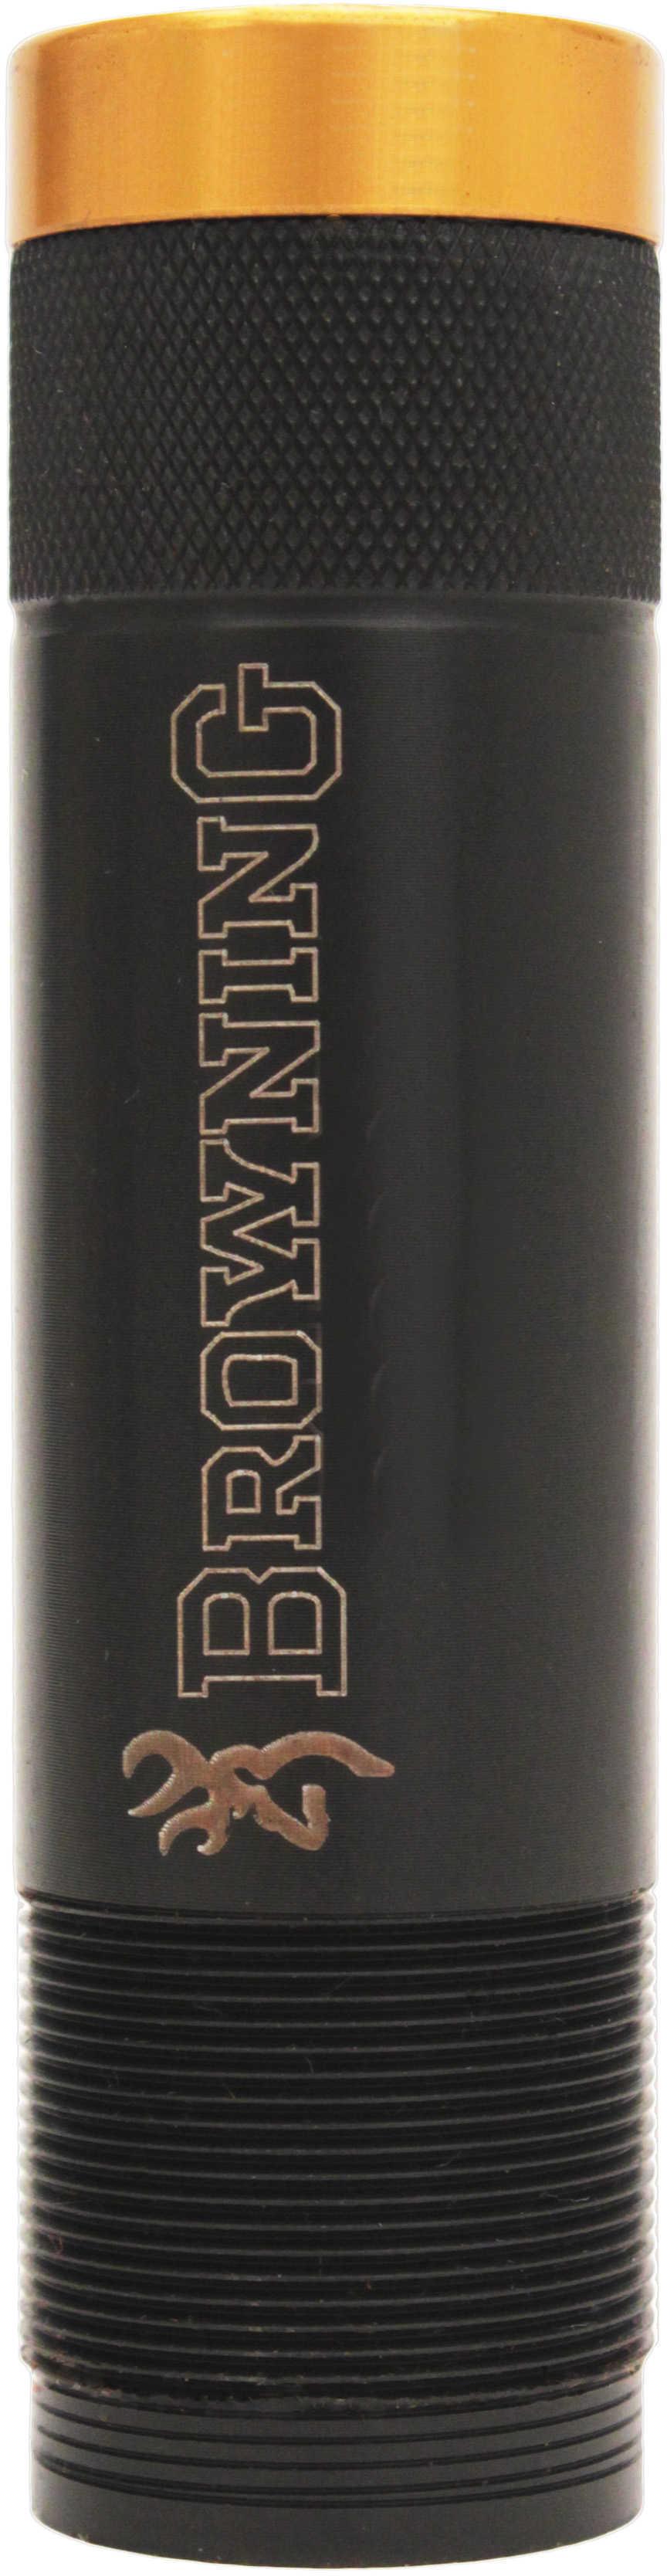 Browning Midas Grade Extended Choke Tube, 12 Gauge Full Md: 1130153